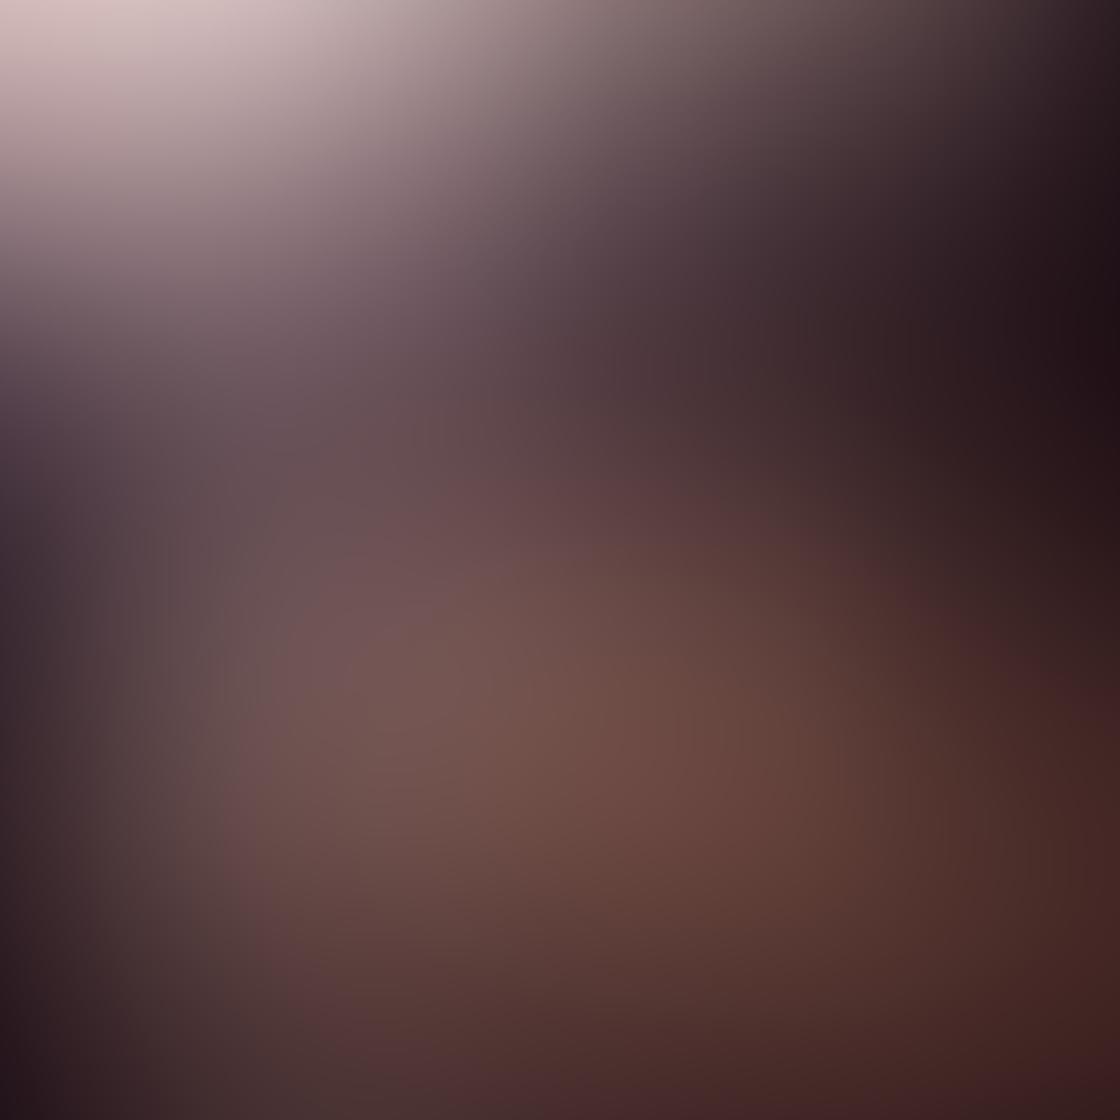 iPhone Photos Lens Flare 9